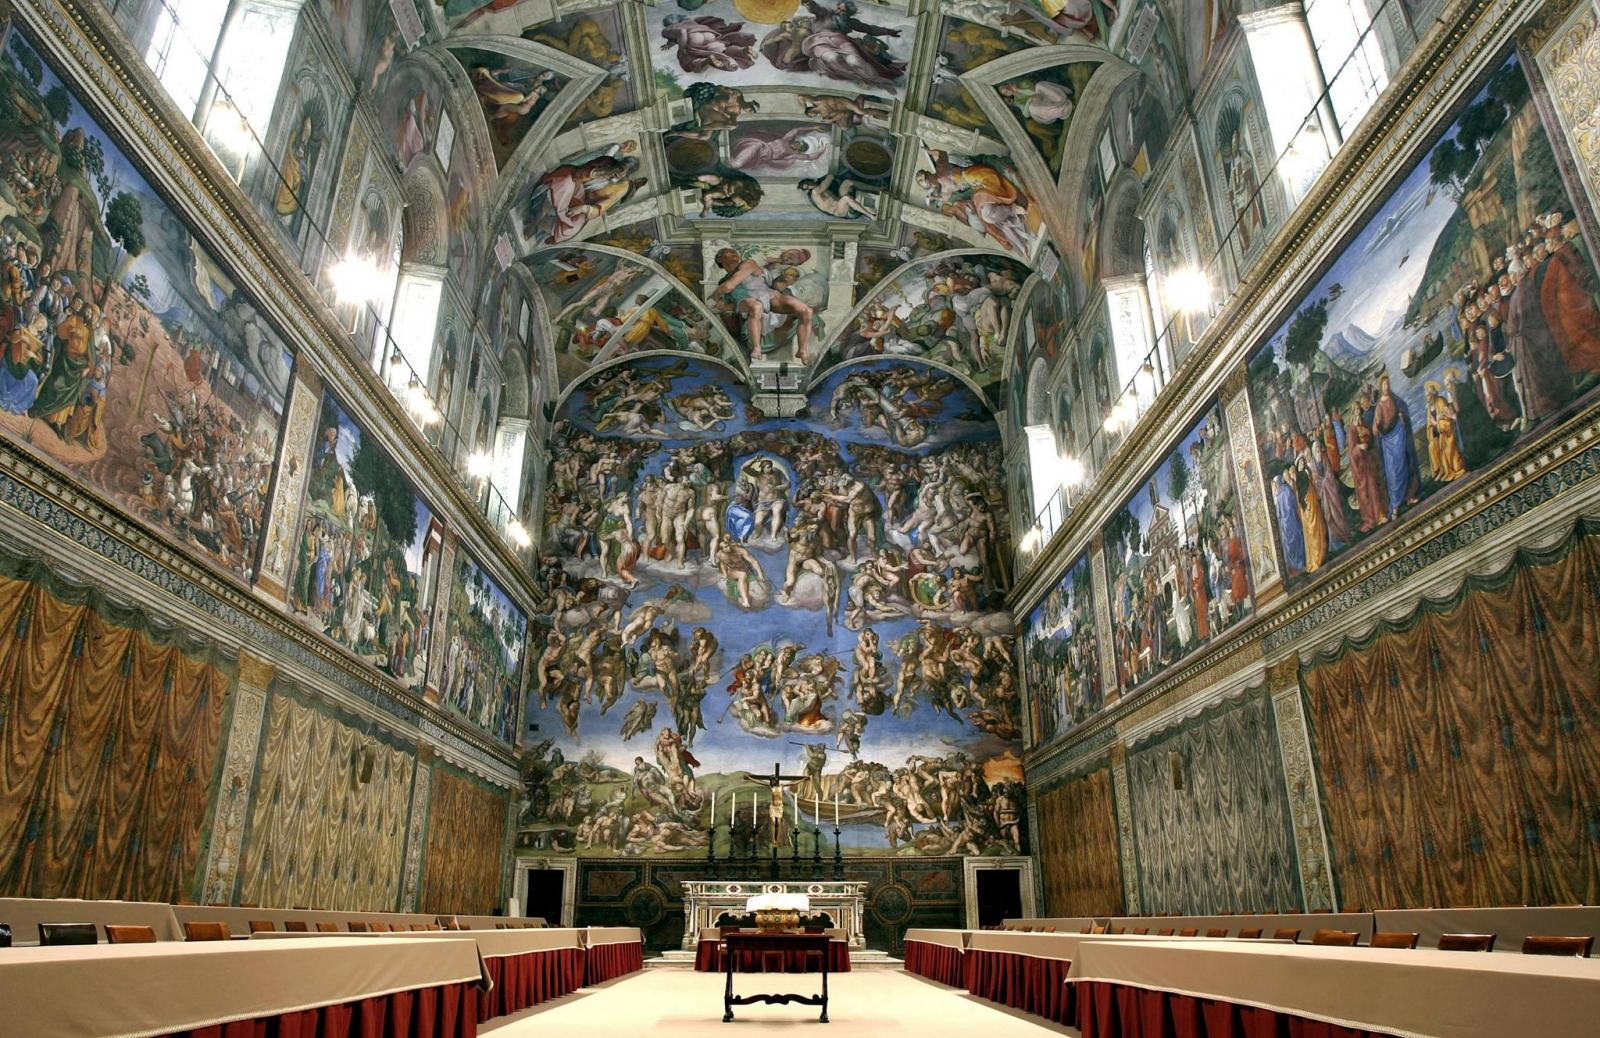 Bức họa trêm vòm của Michelangelo